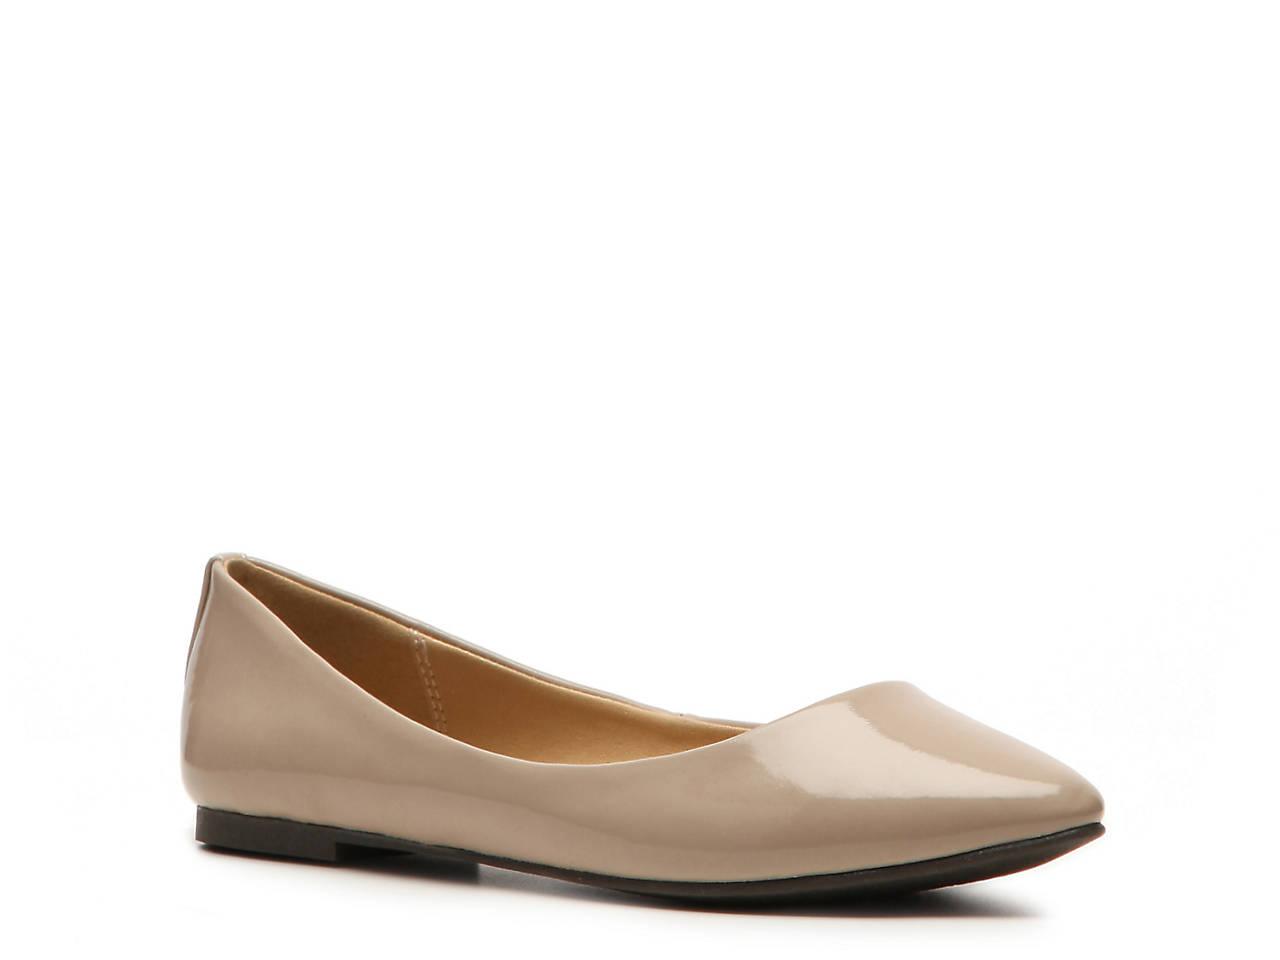 b3c100eb97d8 Steve Madden Angel Patent Flat Women s Shoes